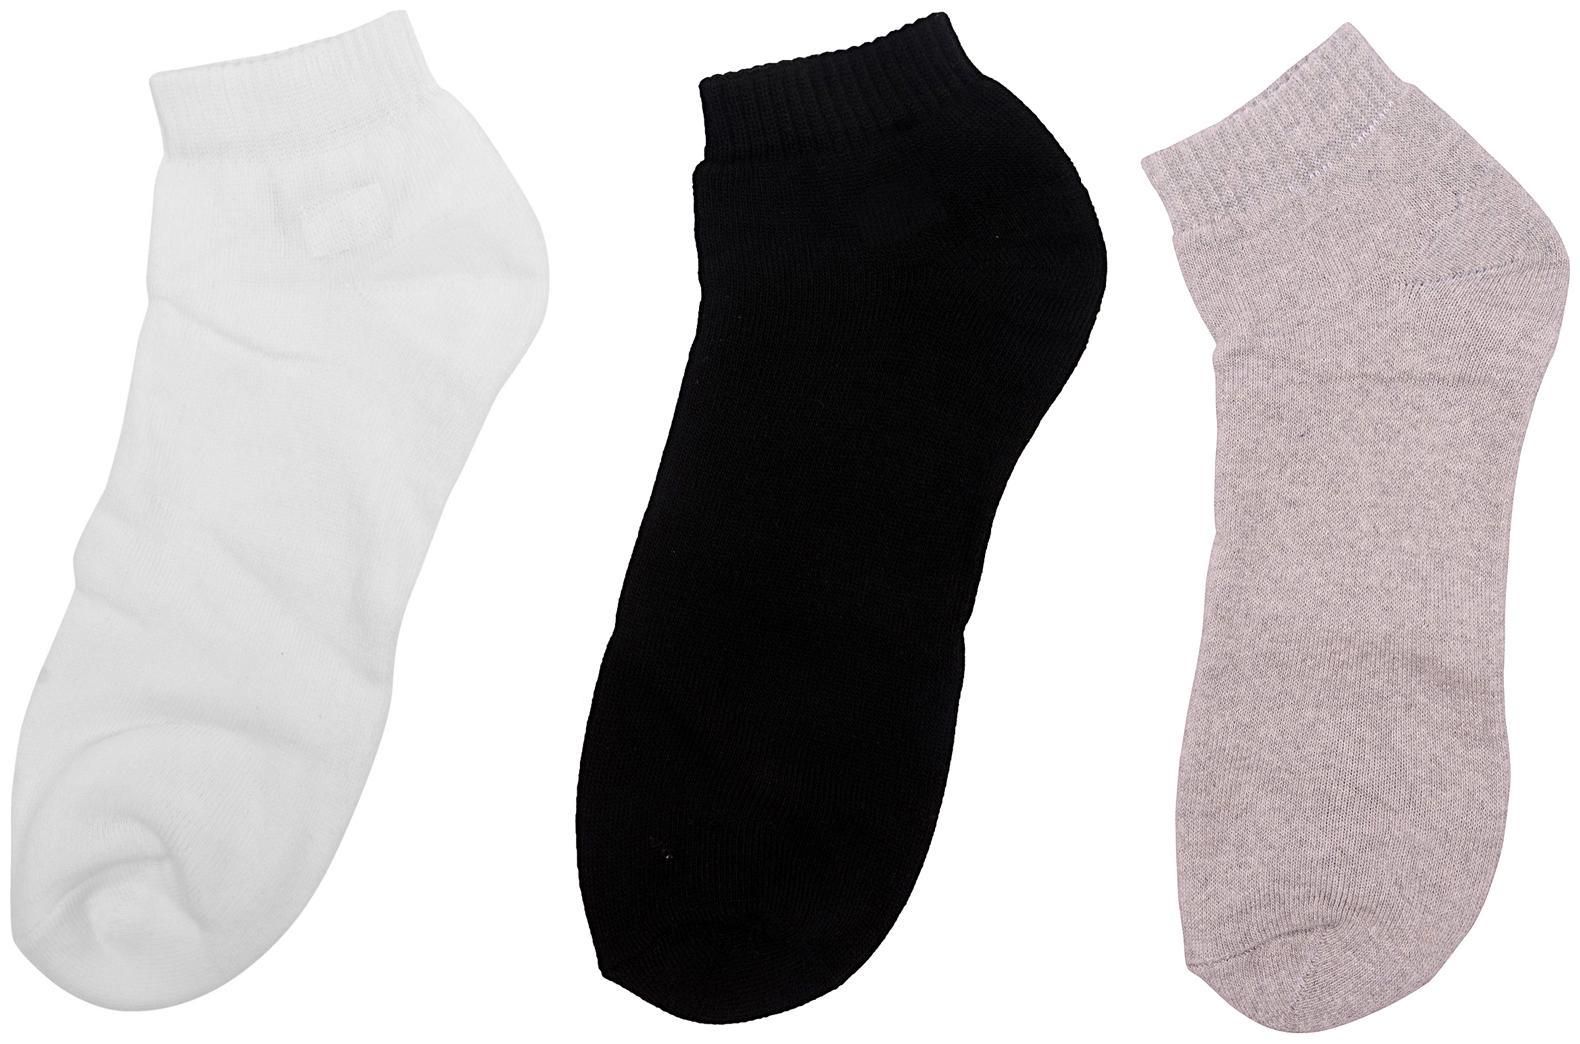 Shopper52  Multicolour Men's Women's Cotton Ankle Length Socks Looks Good in Formal Sports Western   SOCK